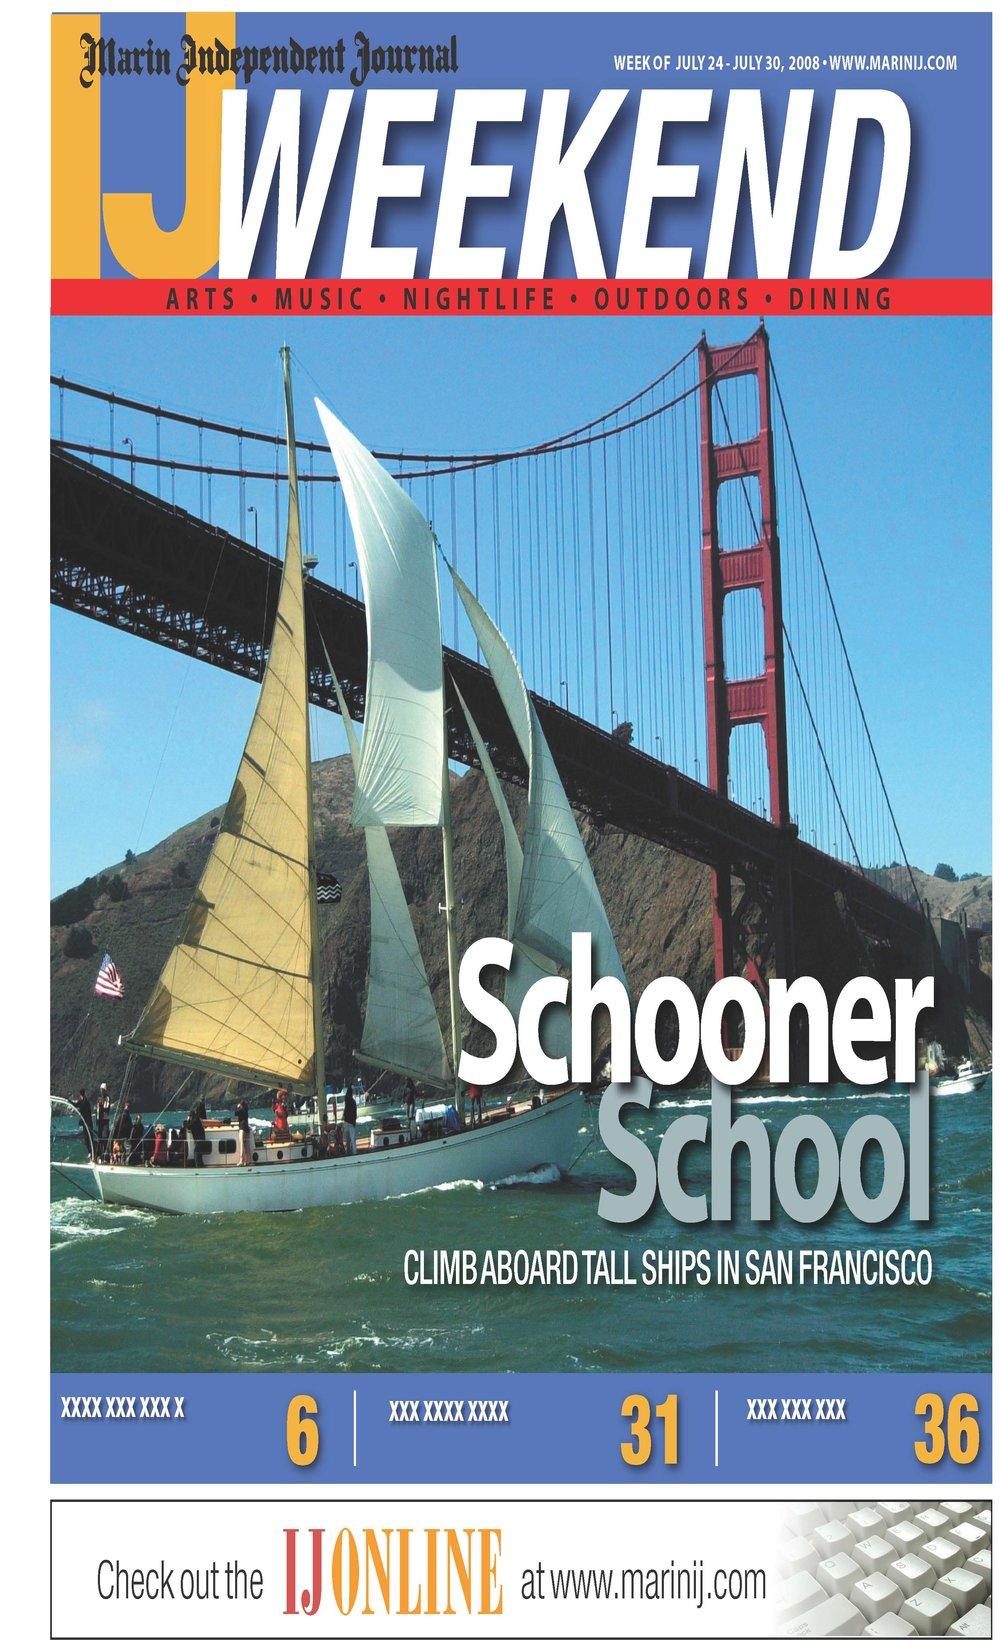 Marin Ij Schooner School Climb Aboard Tall Ships In San Francisco